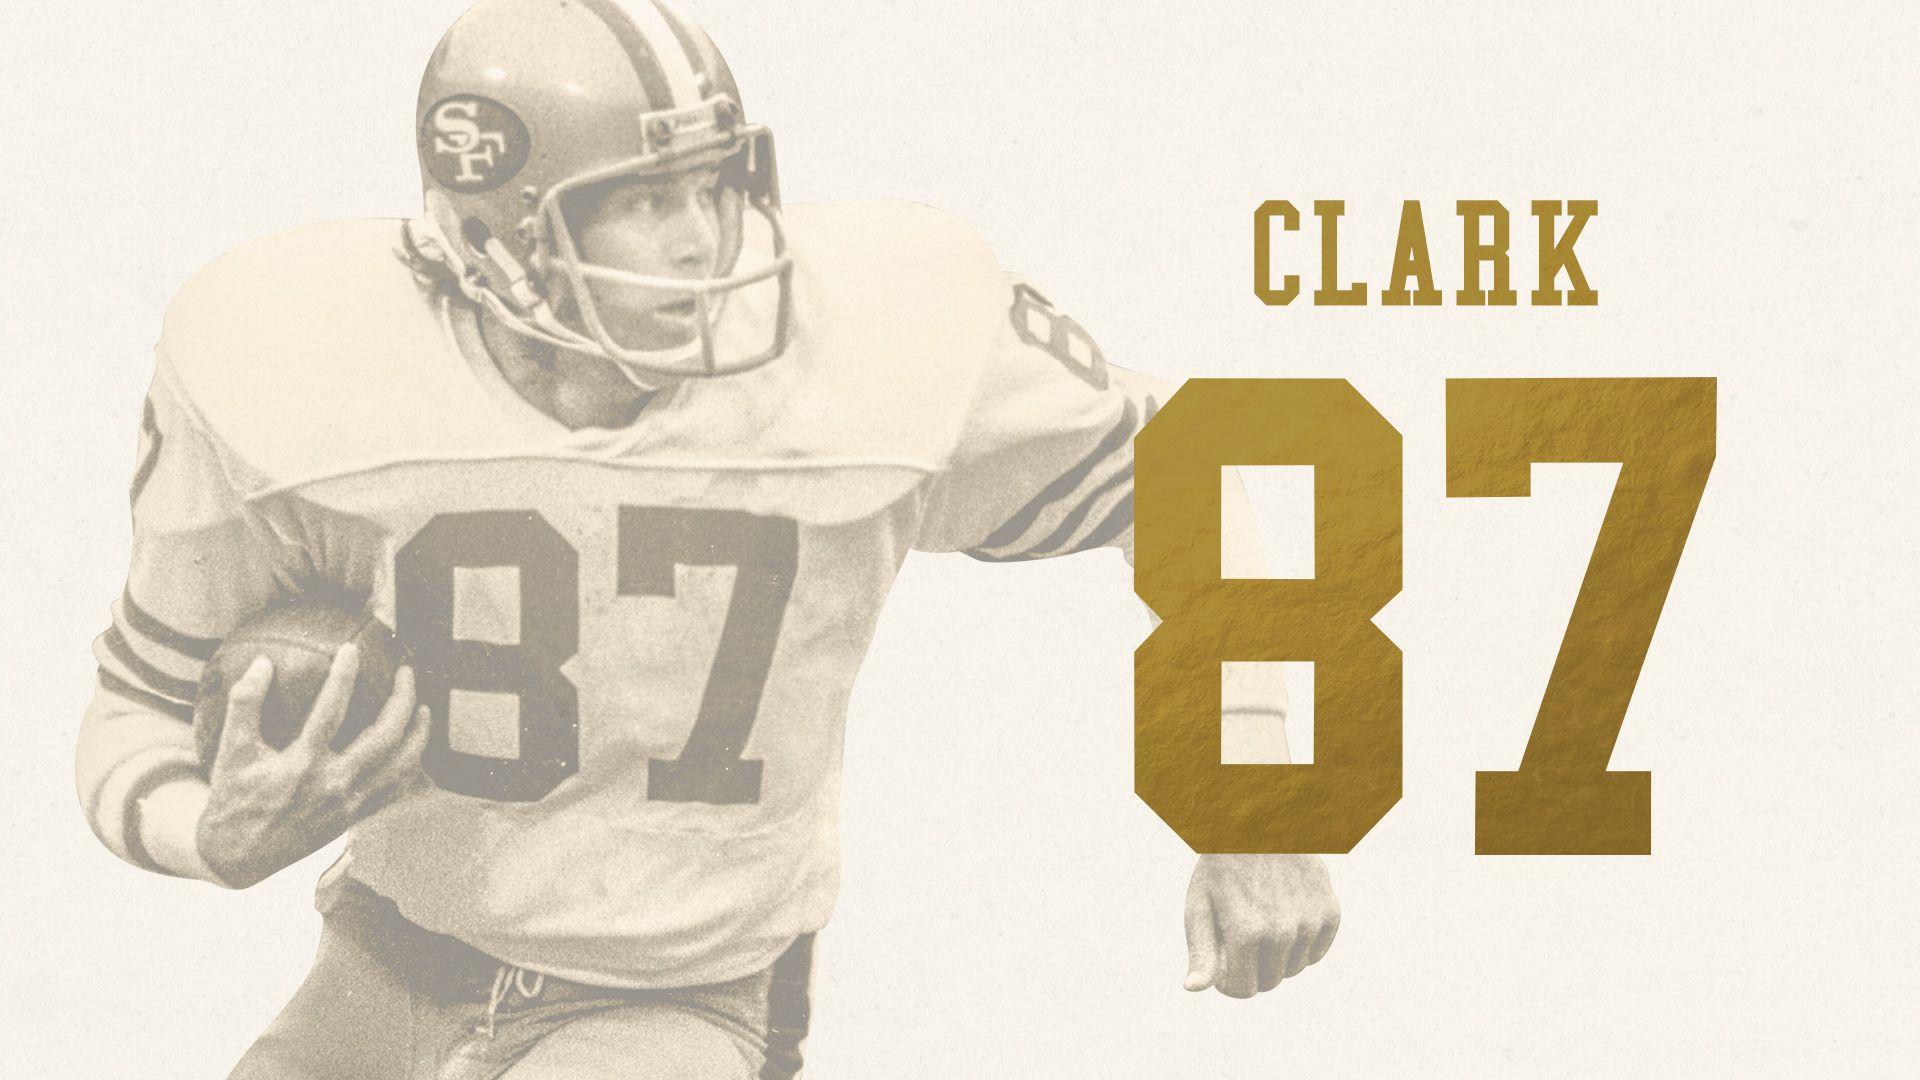 Dwight Clark, WR (1979-1987)